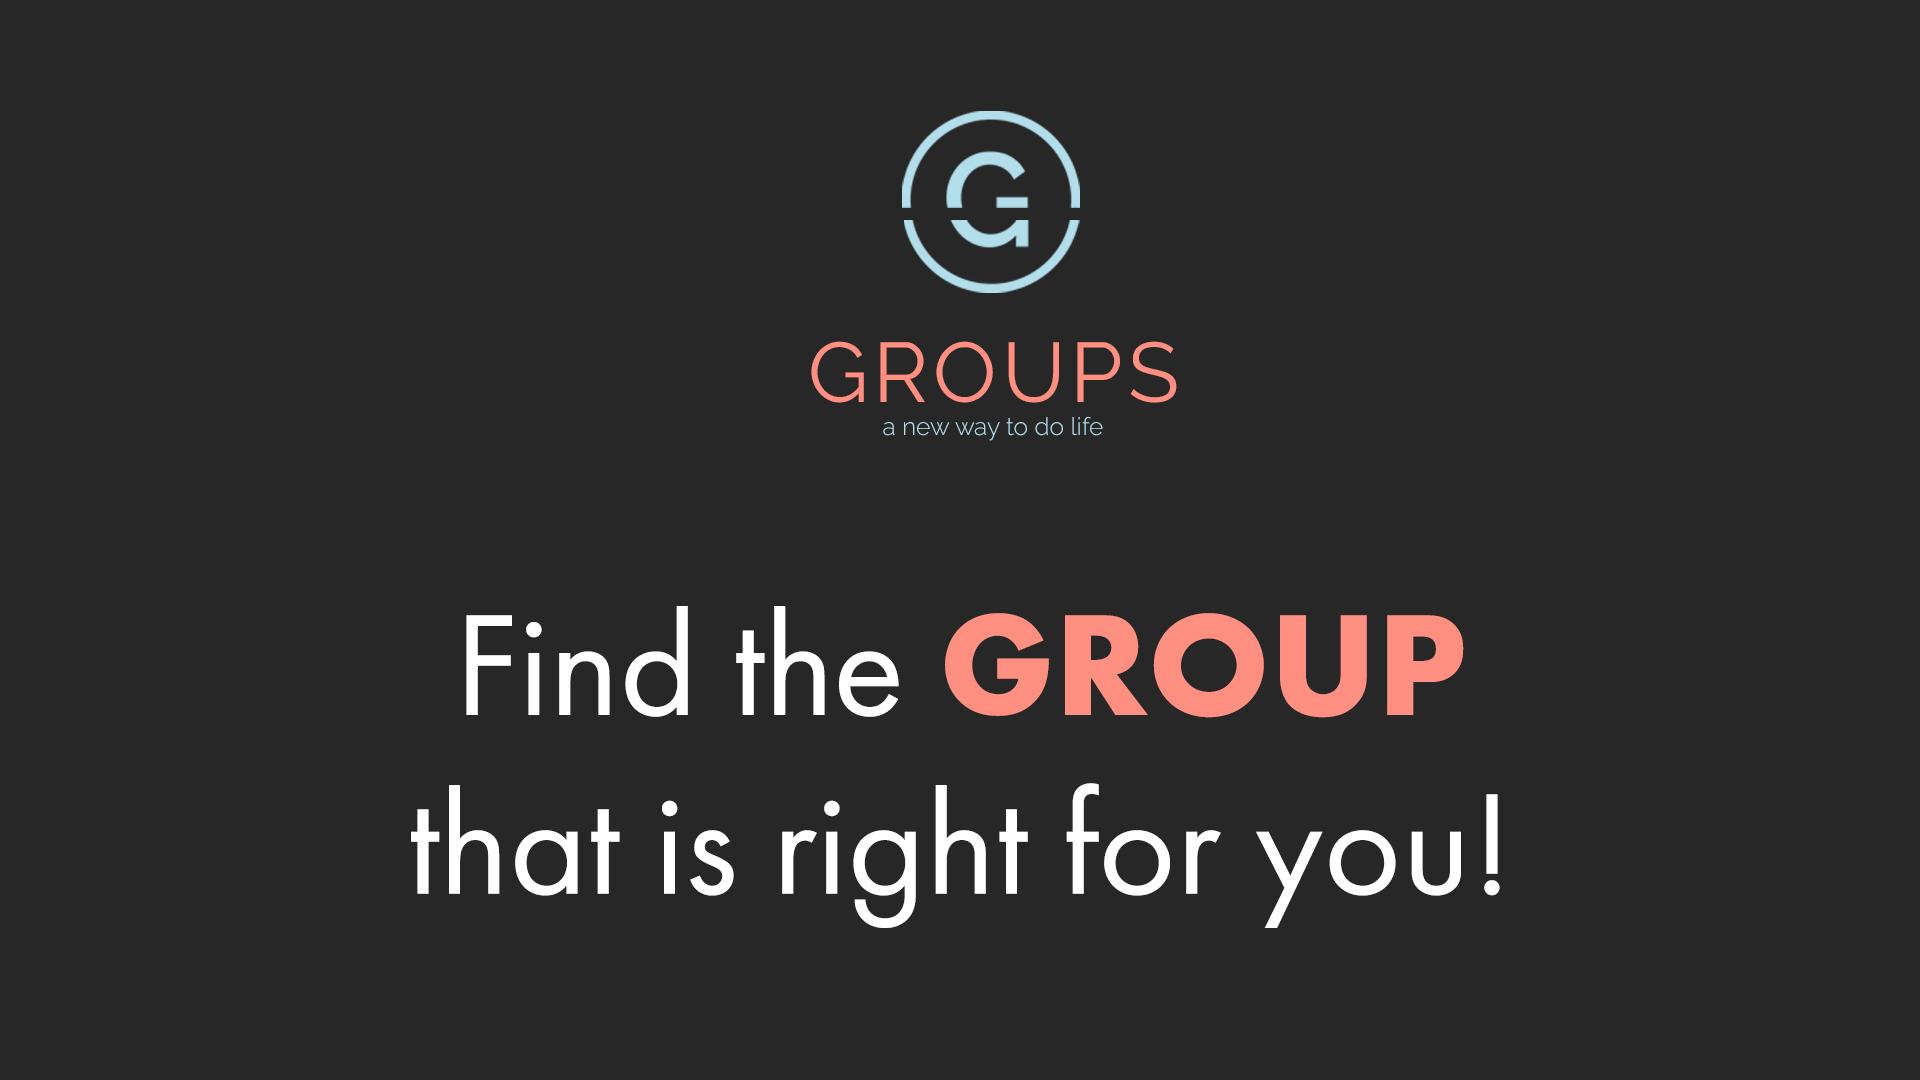 Groups_Web_Info.jpg